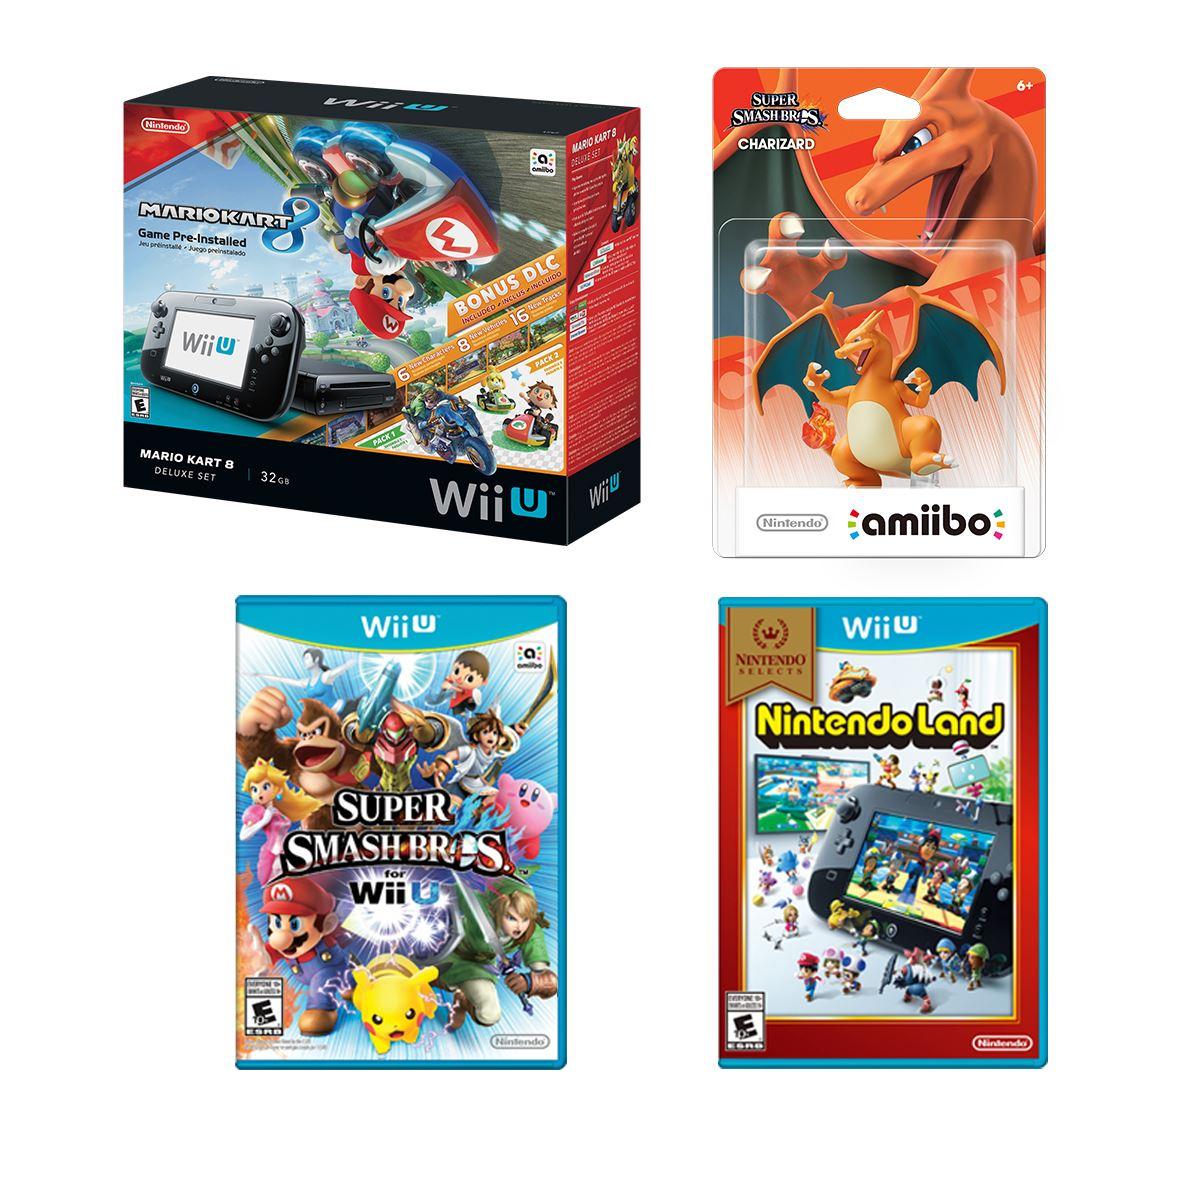 Bundle Consola WiiU Mario Kart 8 + Amiibo + 2 Videojuegos